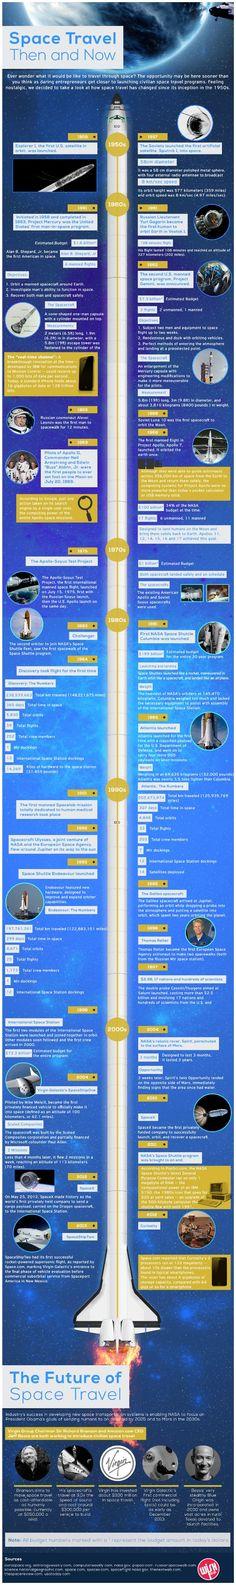 Infographic: Geeky Space Travel | LittleTechGirl.com #Technology